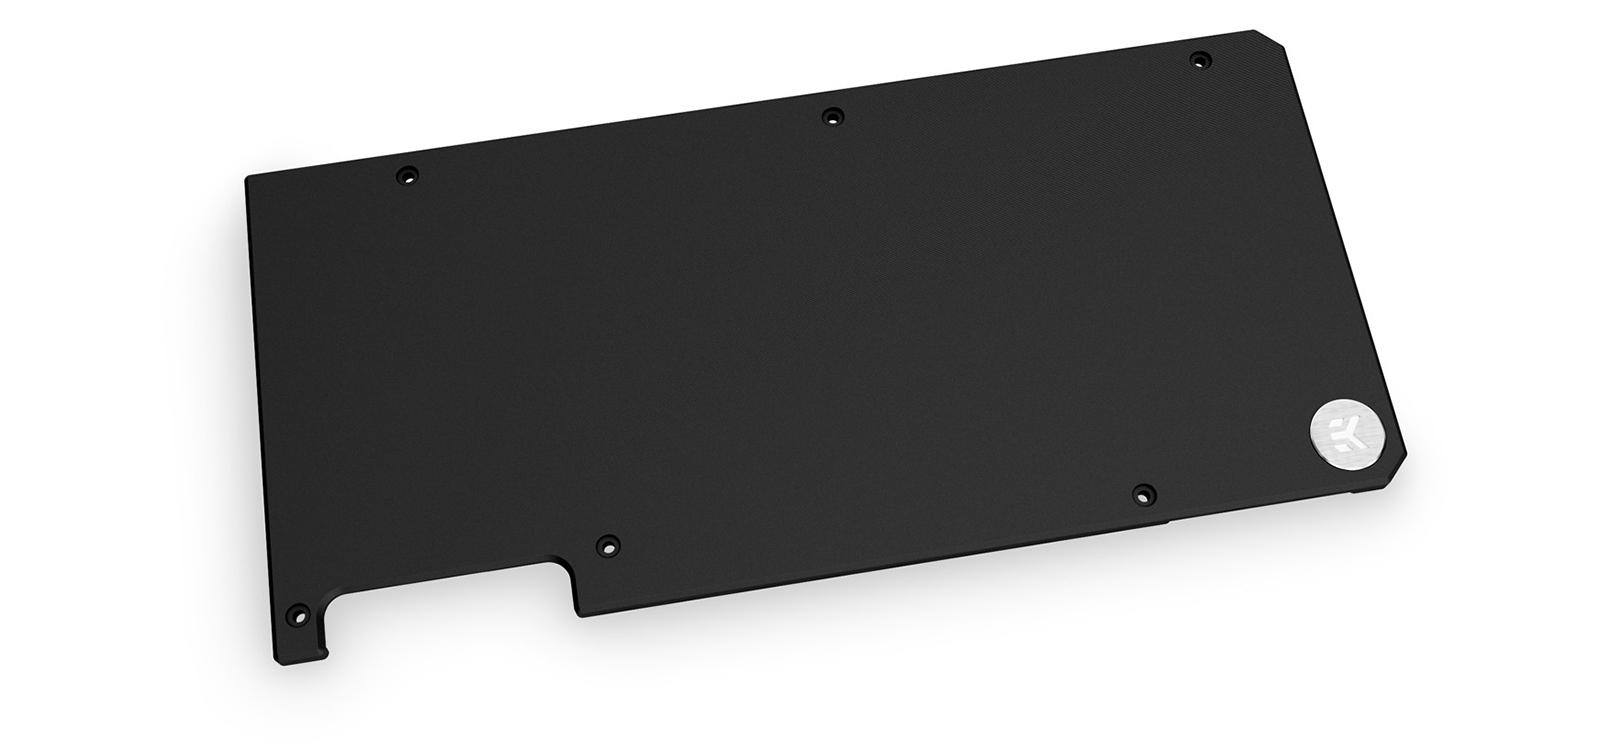 EK-Quantum Vector TUF RTX 3080/3090 Backplate - Black1